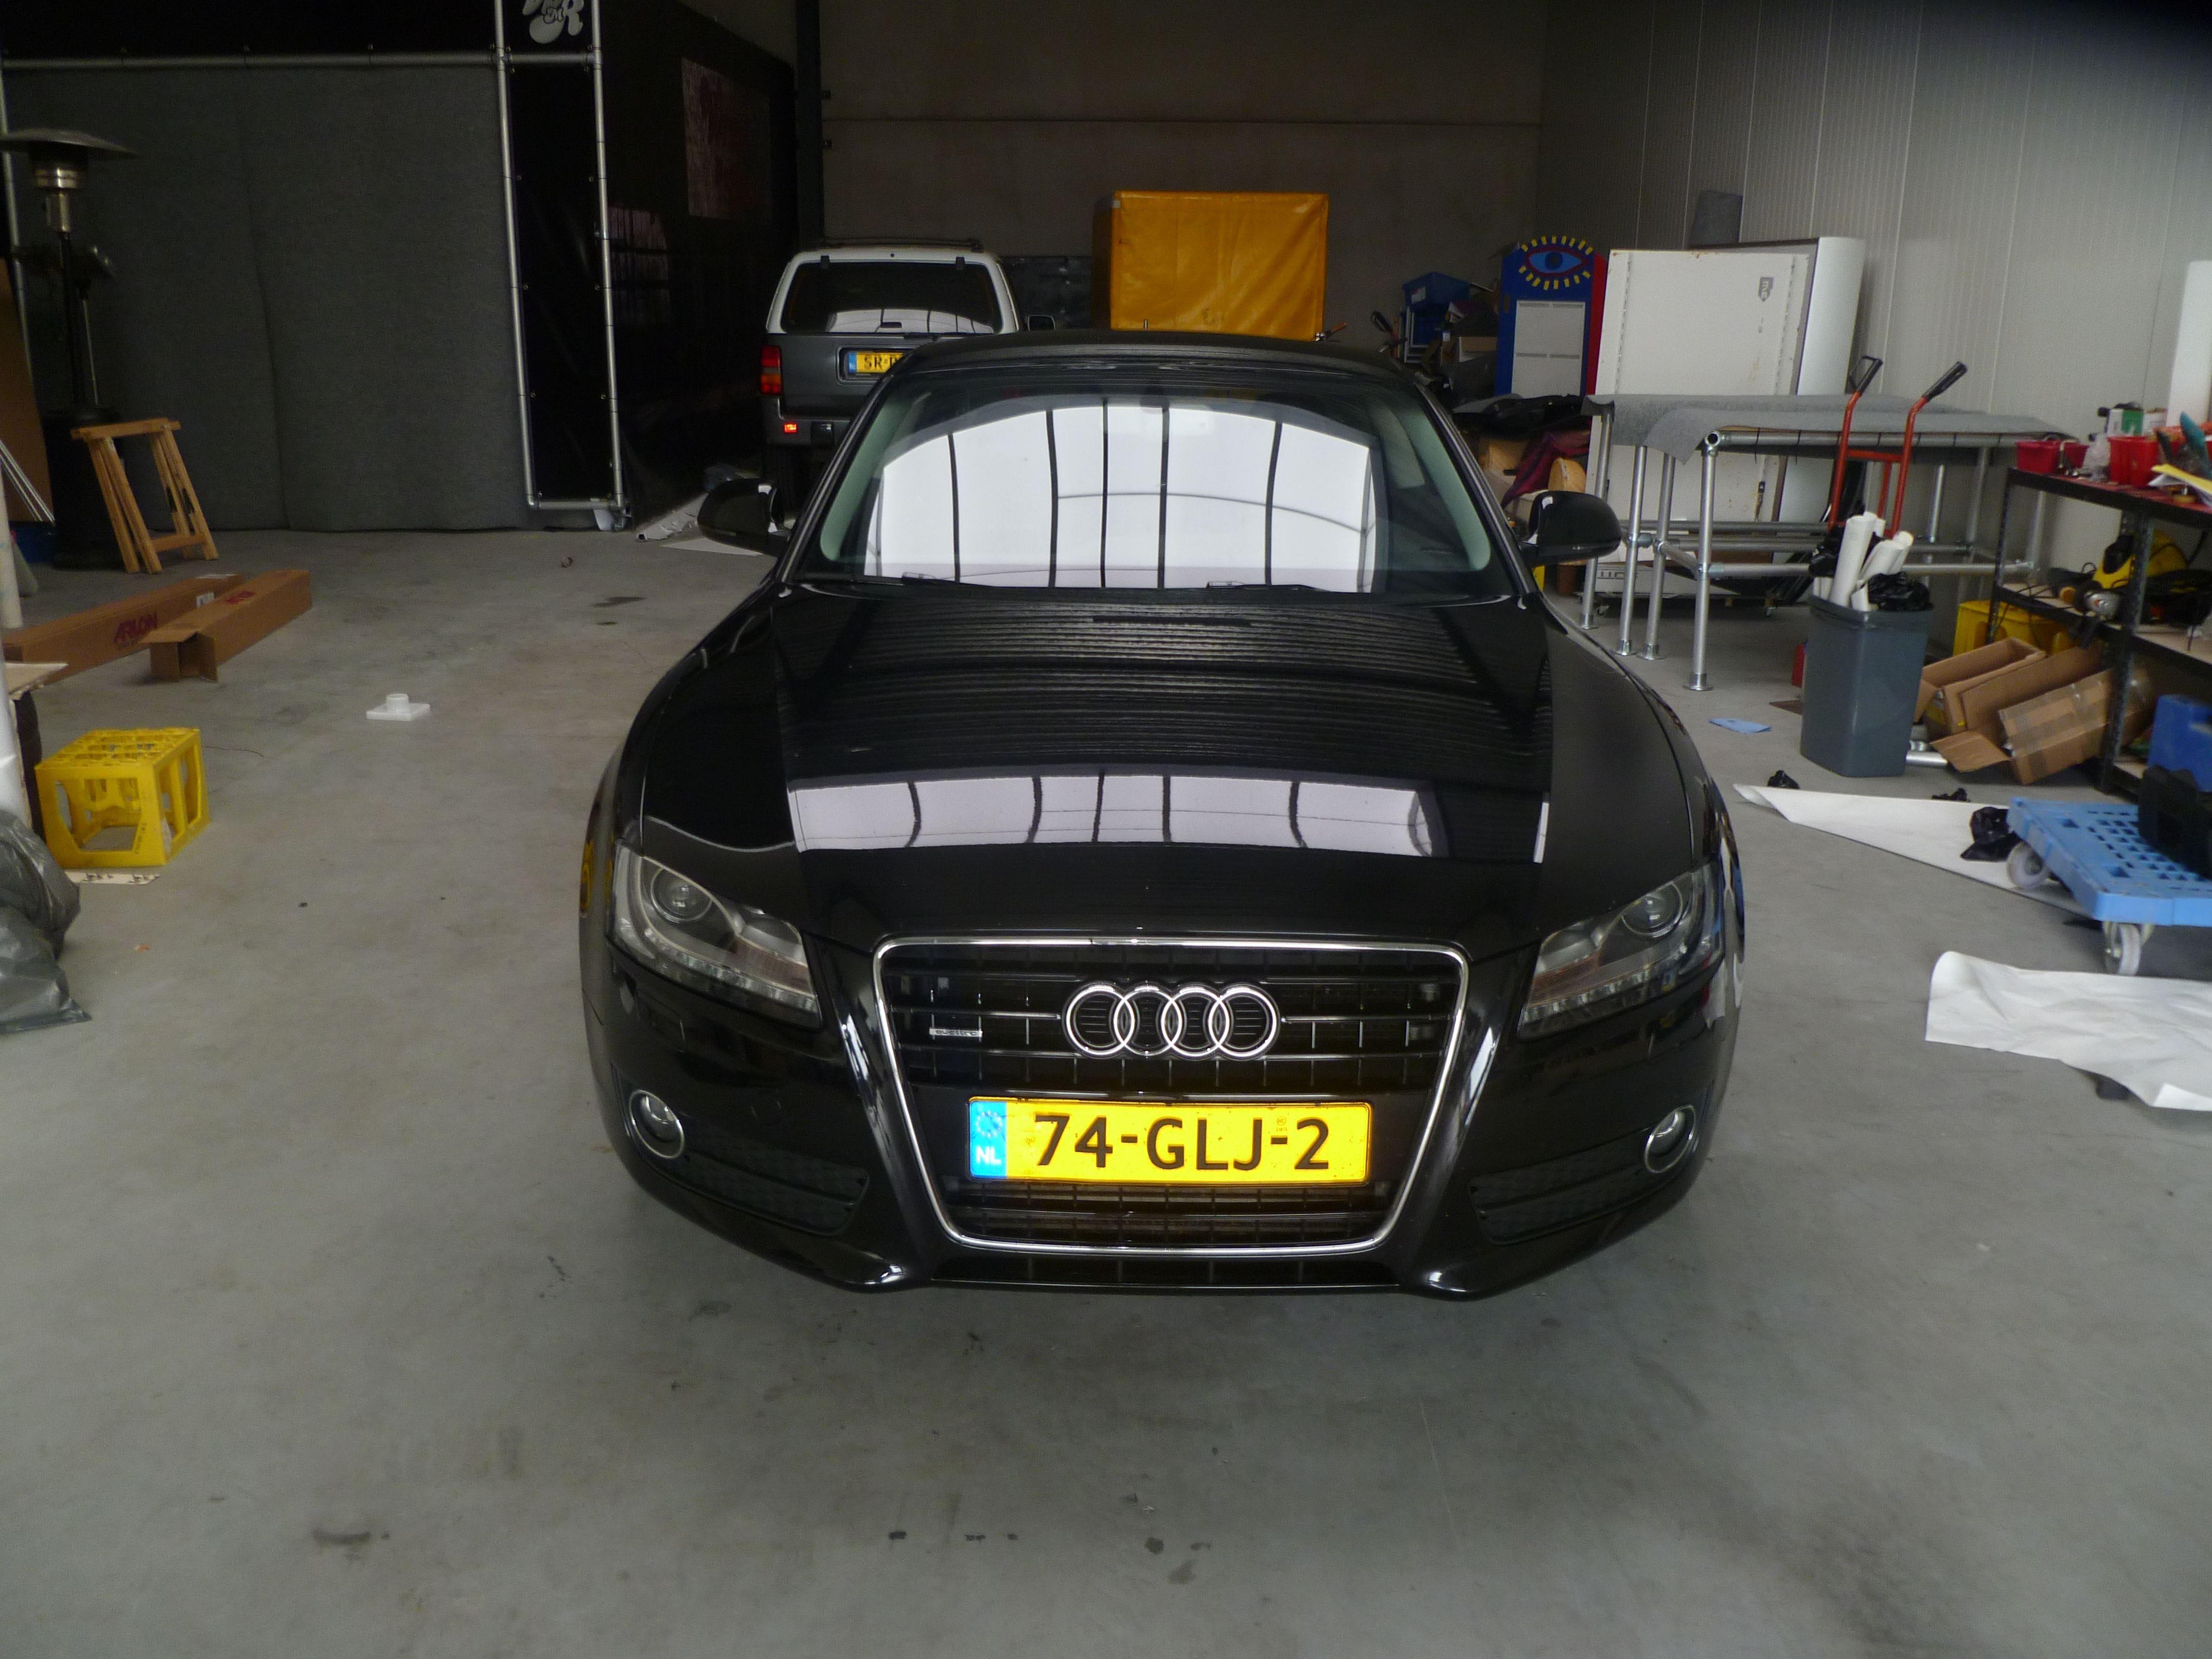 Audi A5 coupe met Metallic Witte Wrap, Carwrapping door Wrapmyride.nu Foto-nr:4670, ©2021